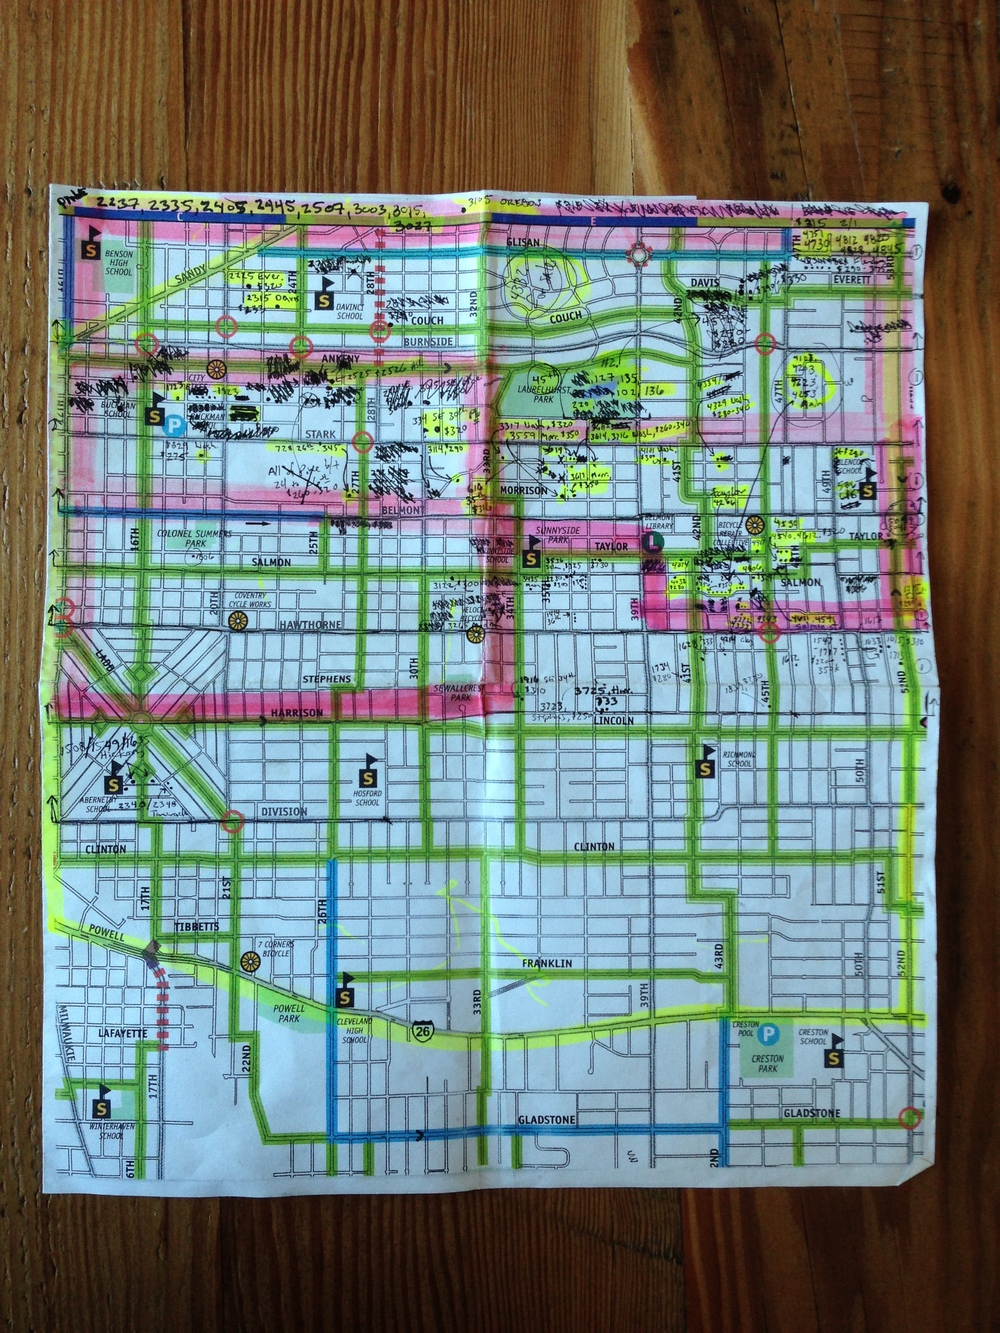 Brian & Laura's detailed map of their favorite neighborhoods!